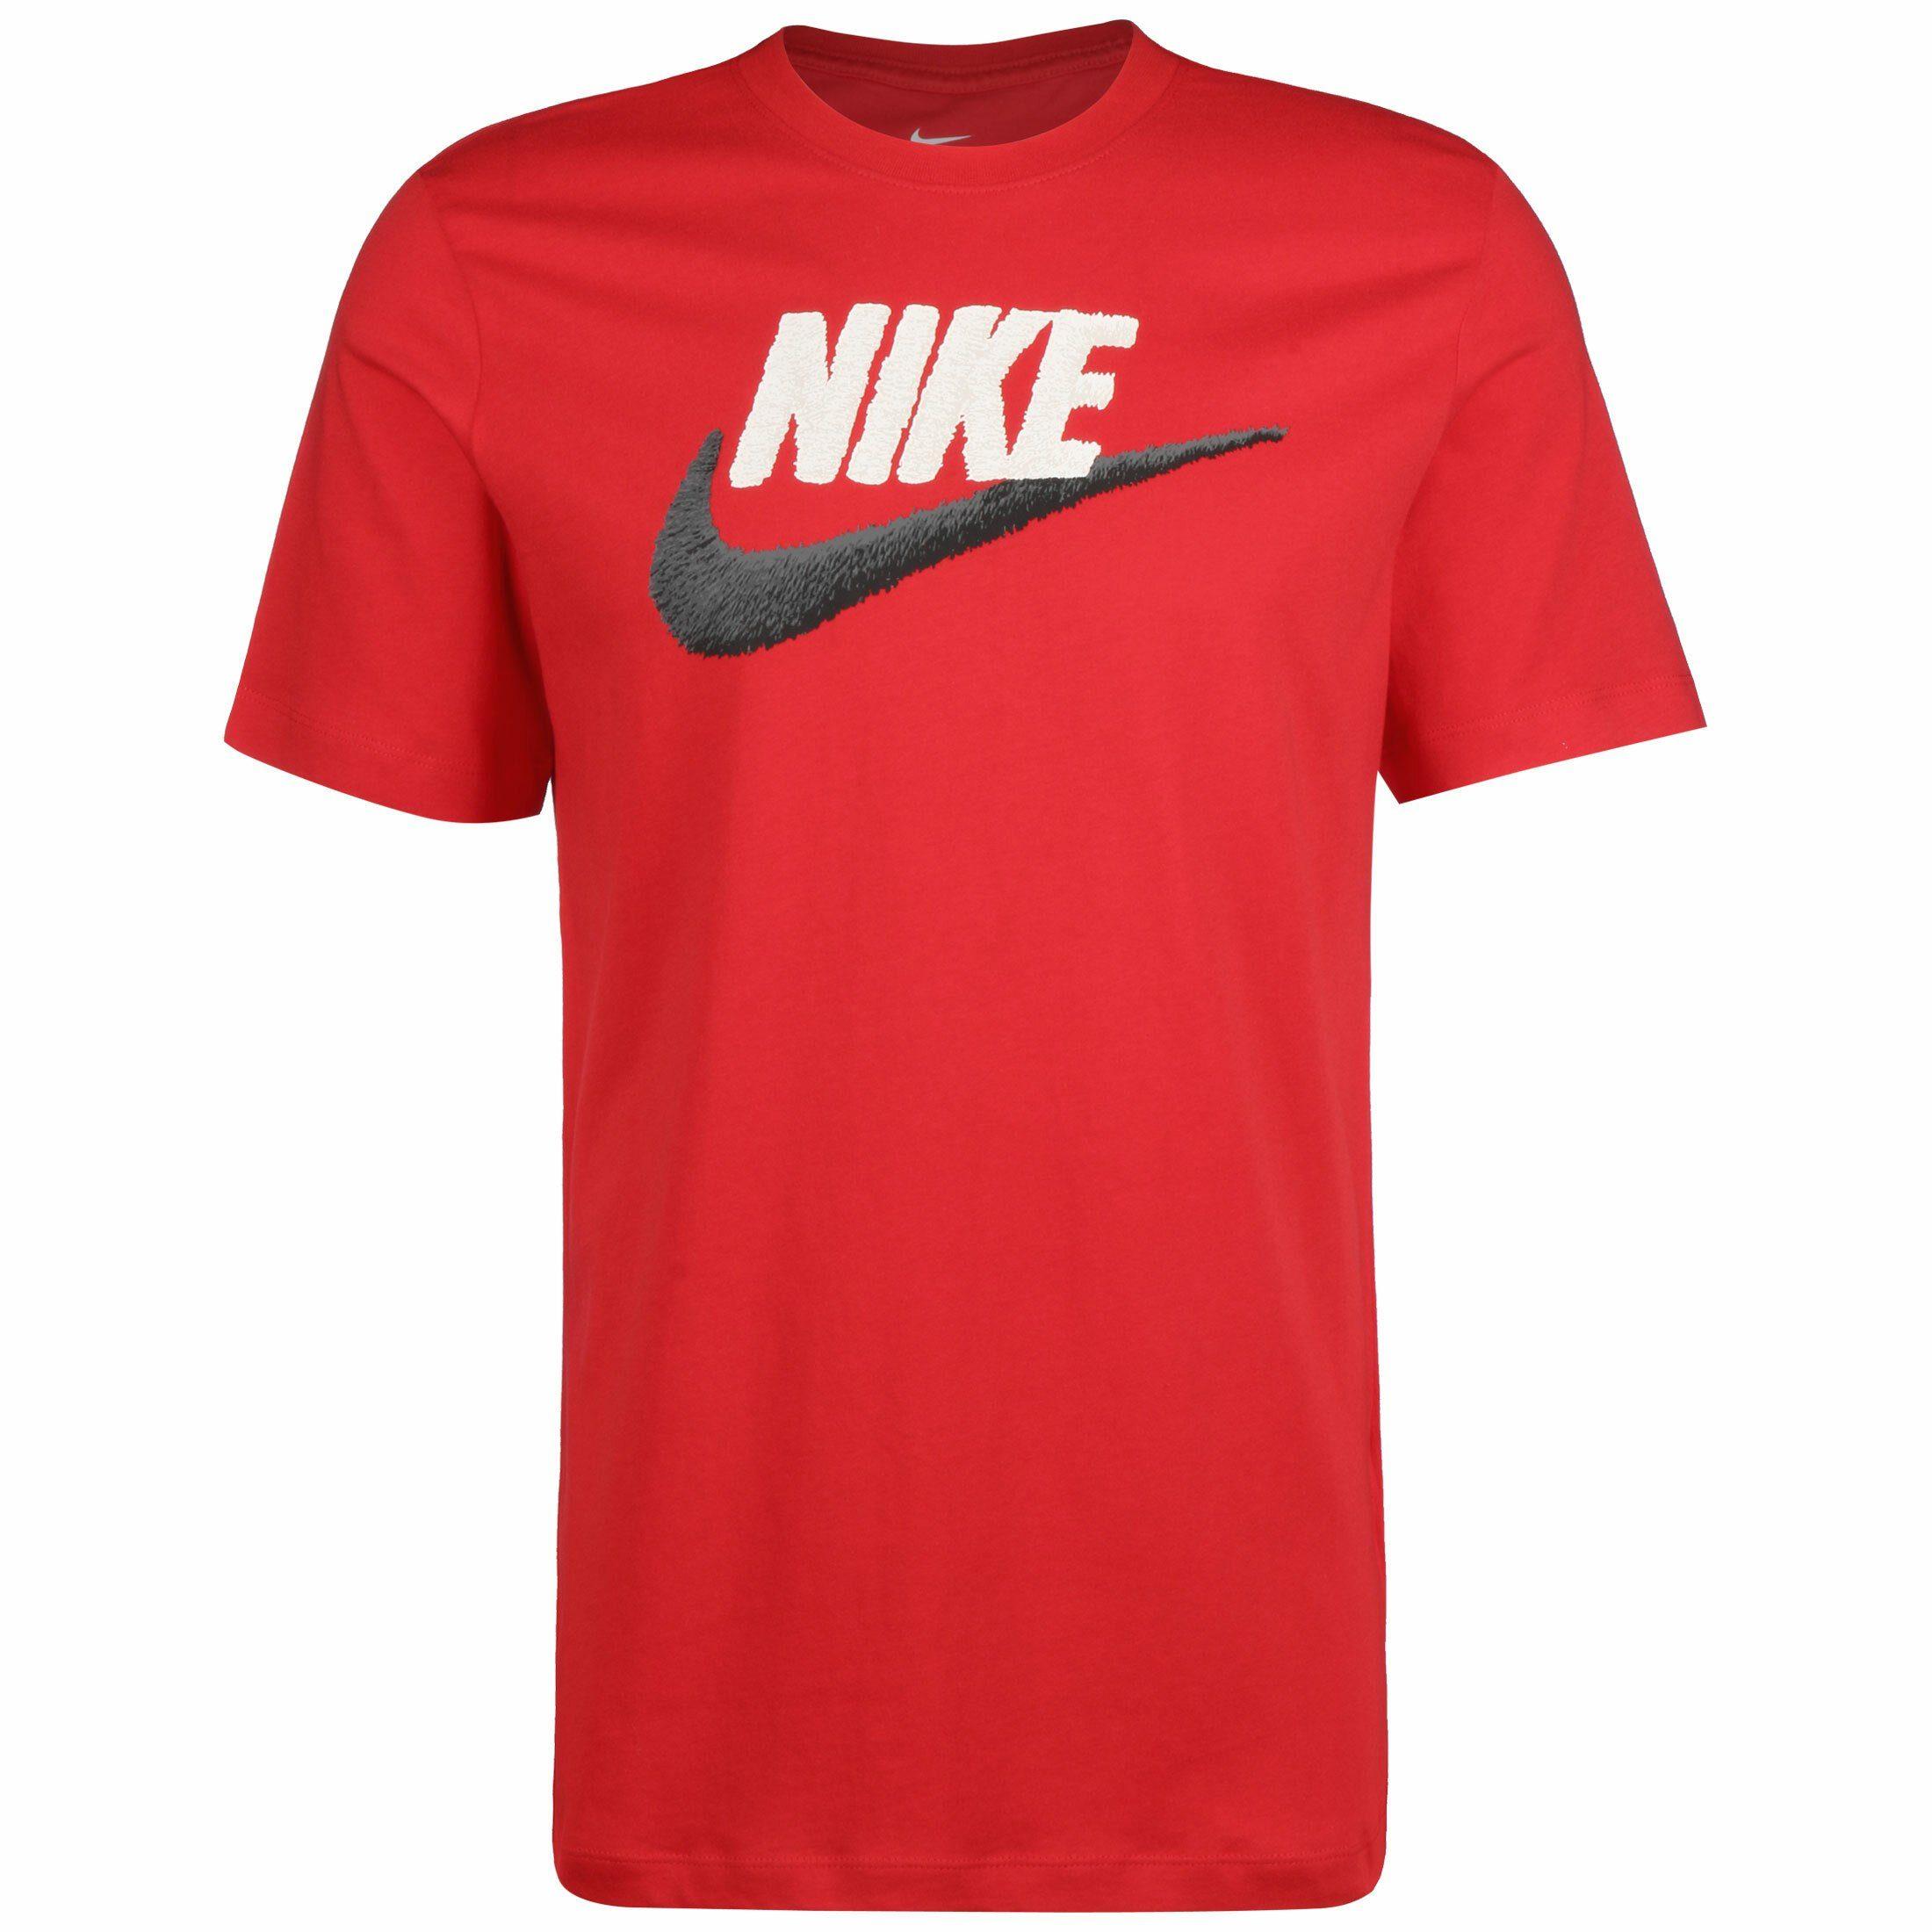 Nike Sportswear T-Shirt Brand Mark | Sportbekleidung > Sportshirts > T-Shirts | Rot | Nike Sportswear